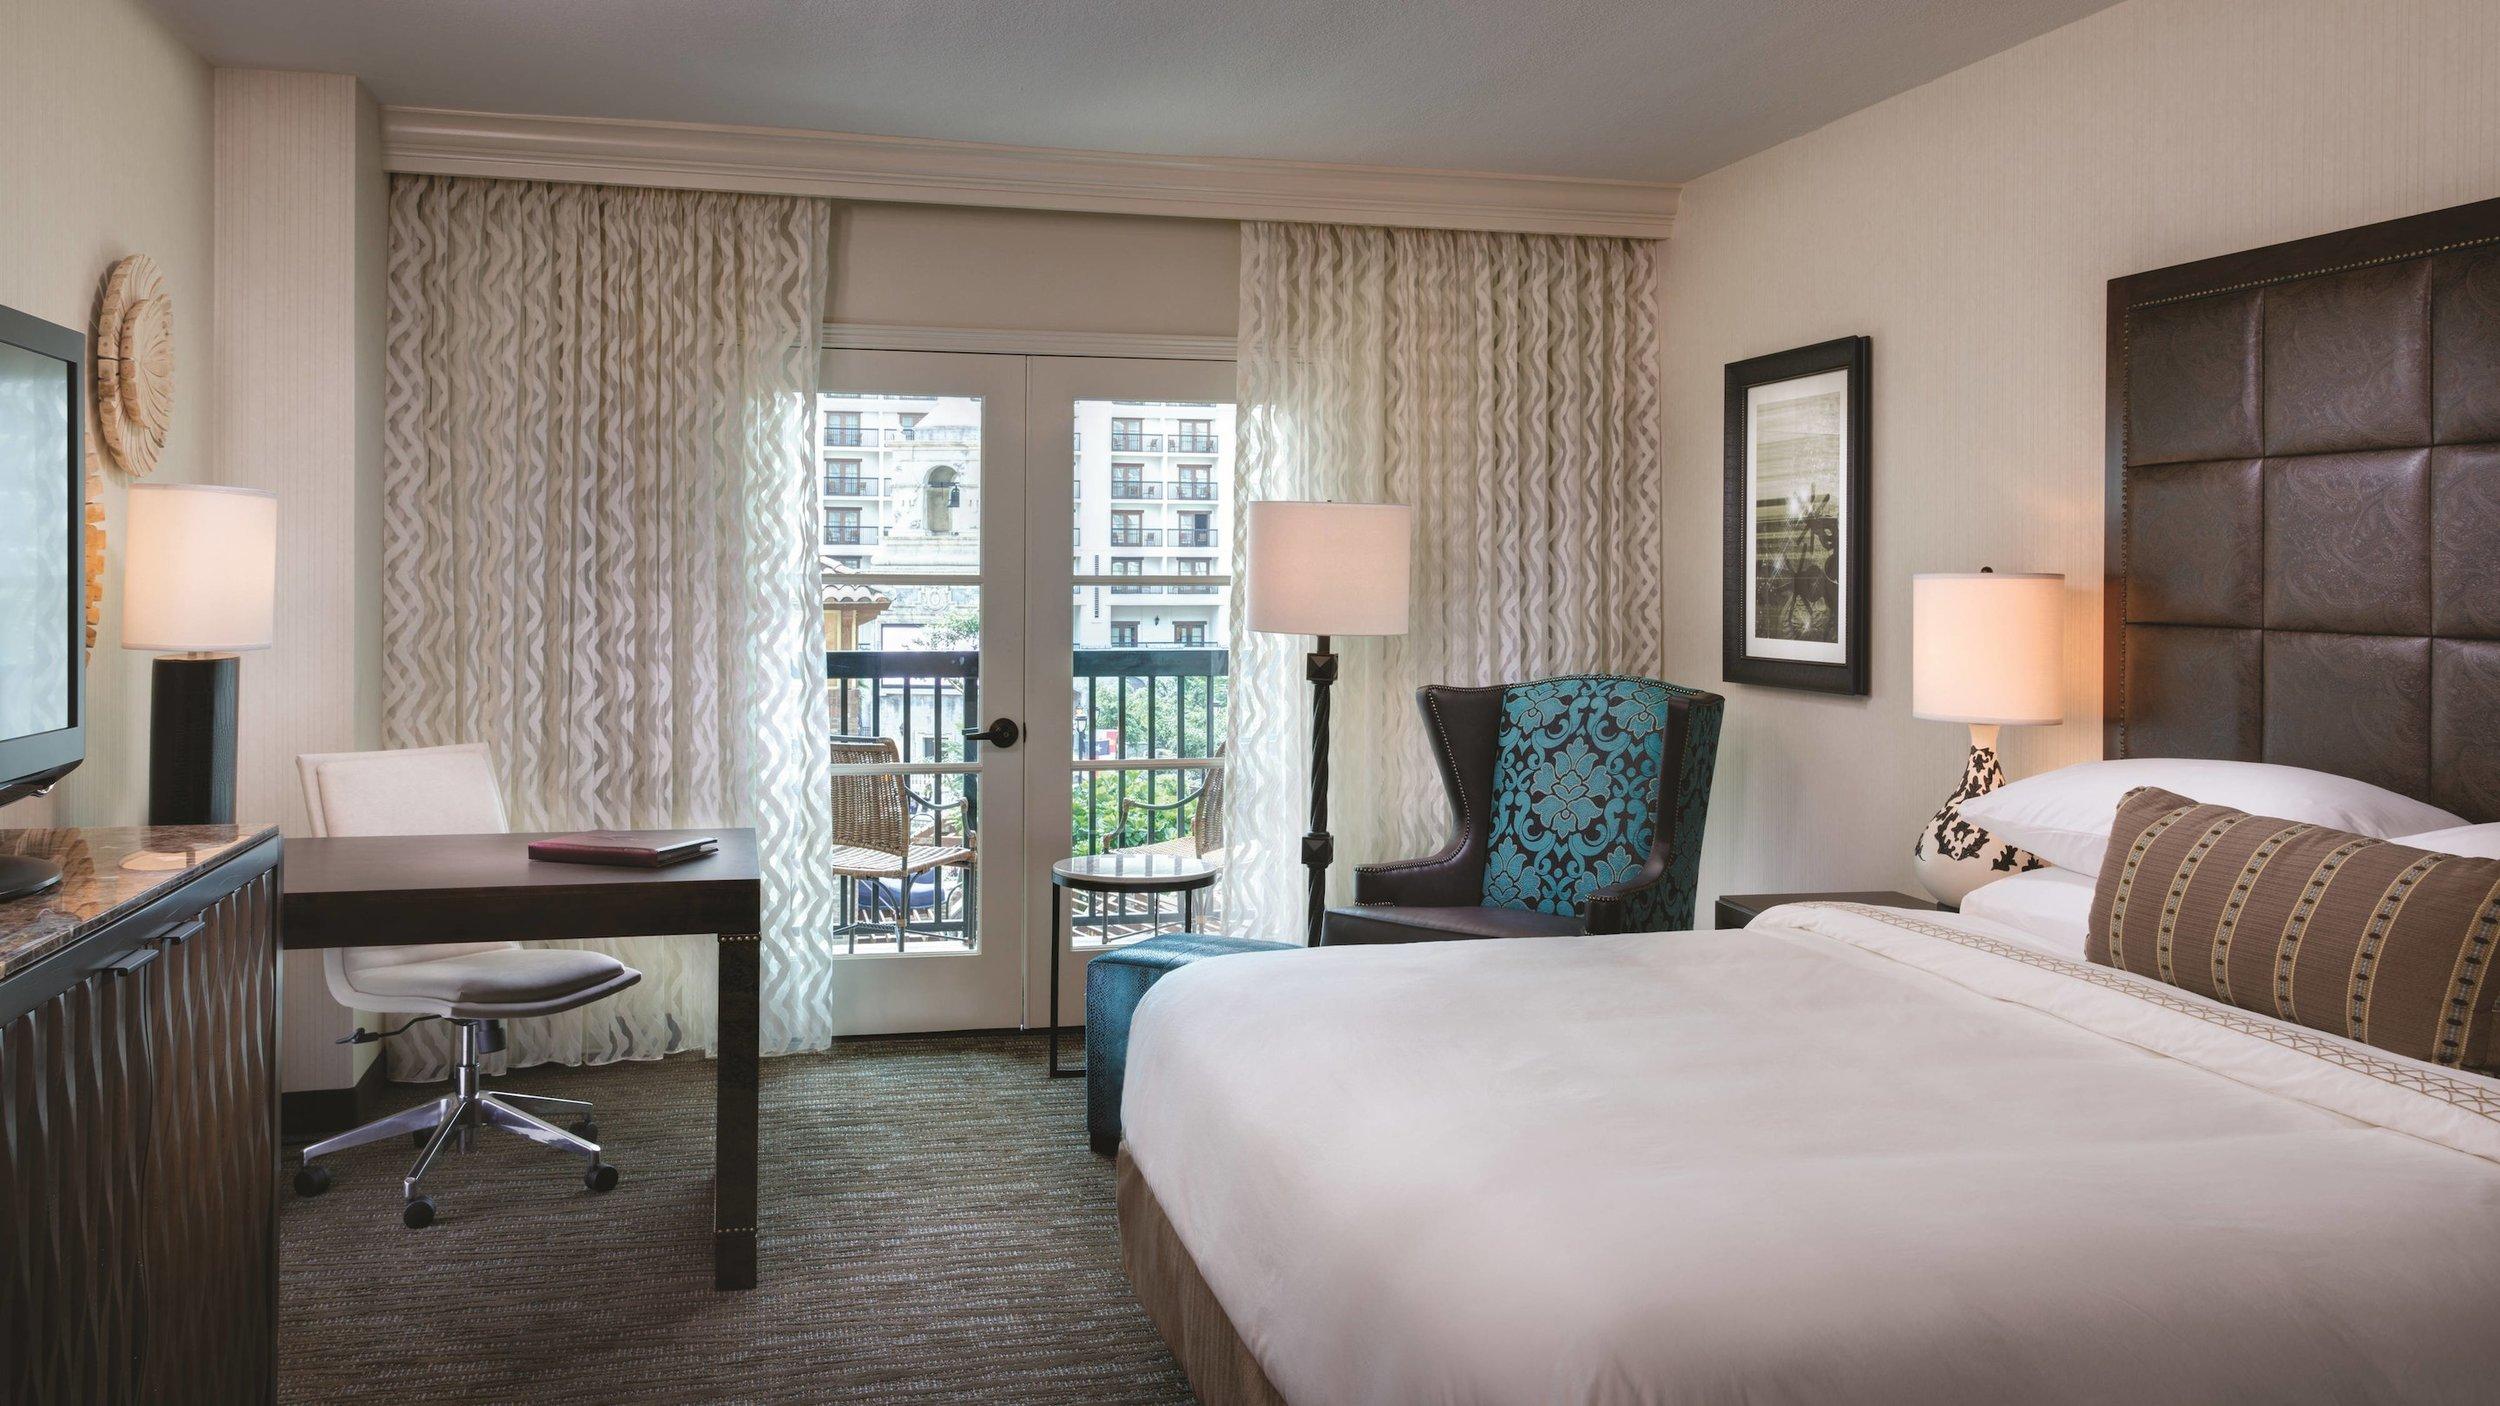 dalgt-guestroom-0047-hor-wide.jpg